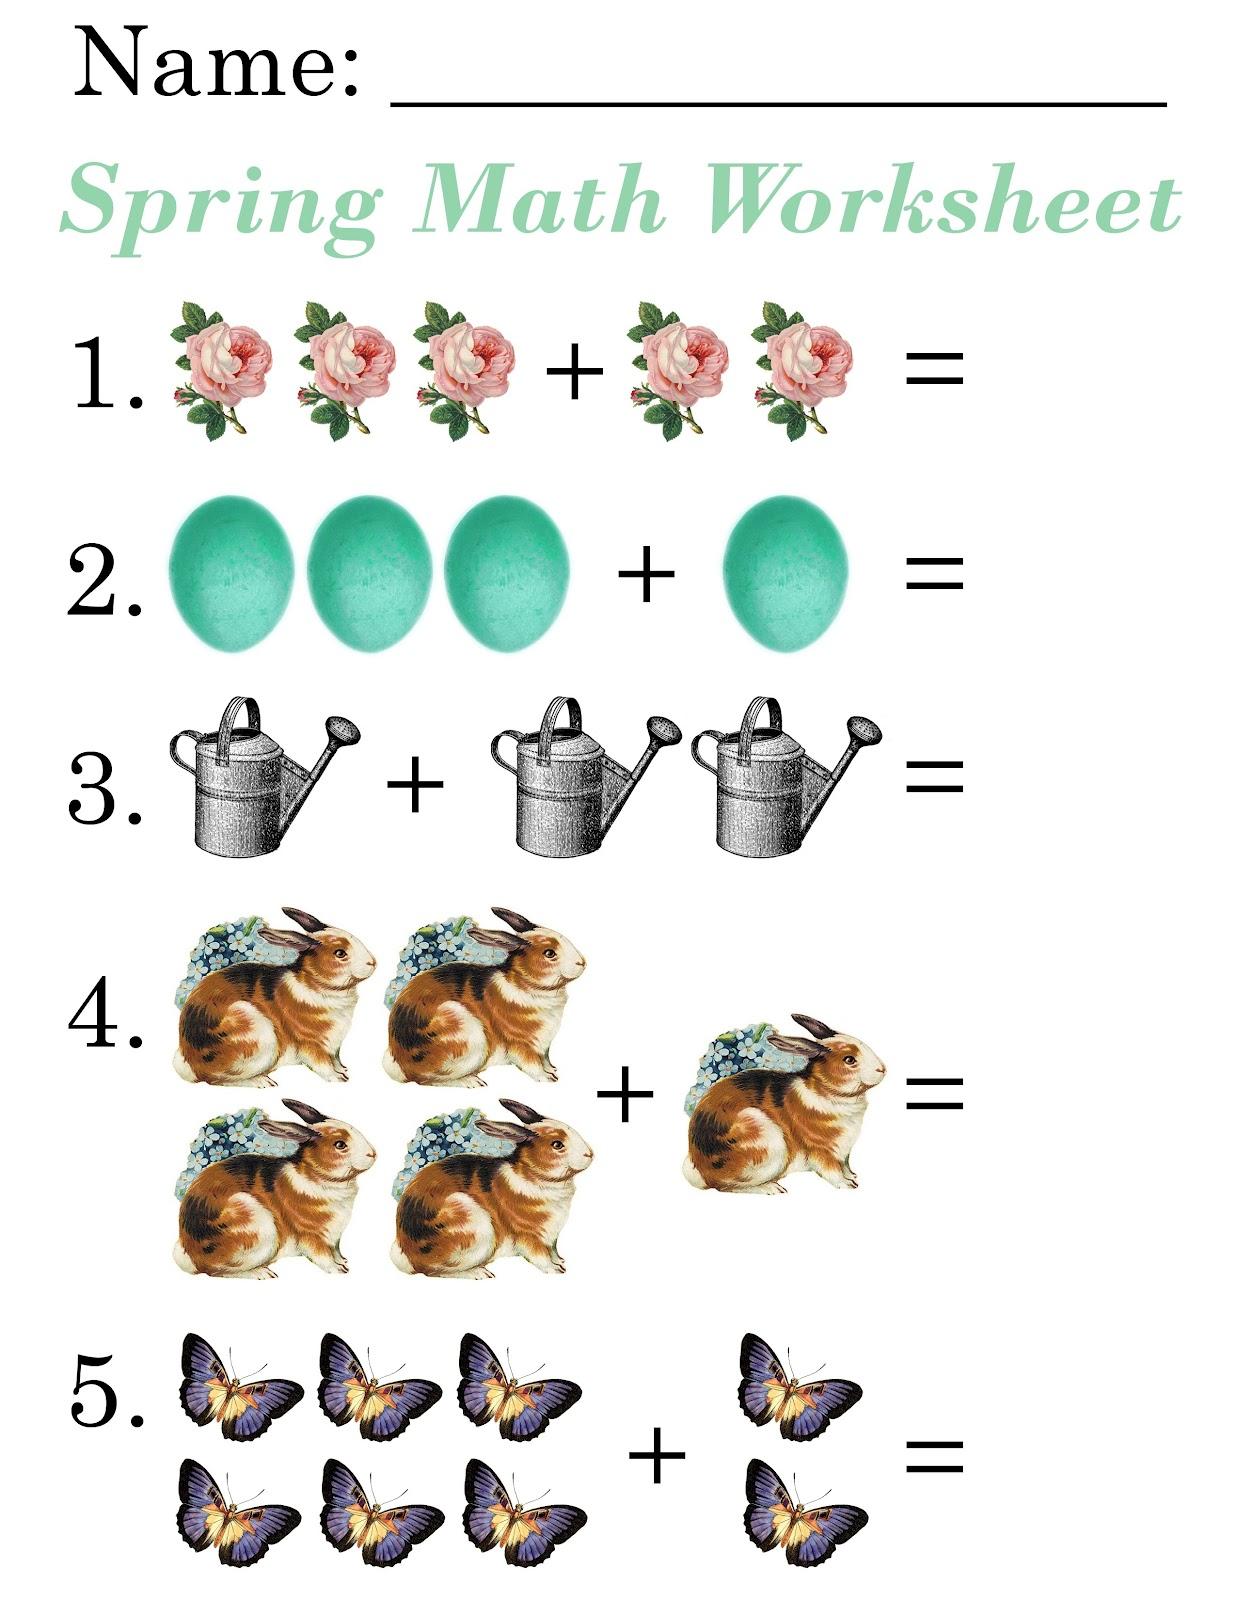 math worksheet : lilac lavender kids spring math worksheets  clipart kid : Math For Kids Worksheets